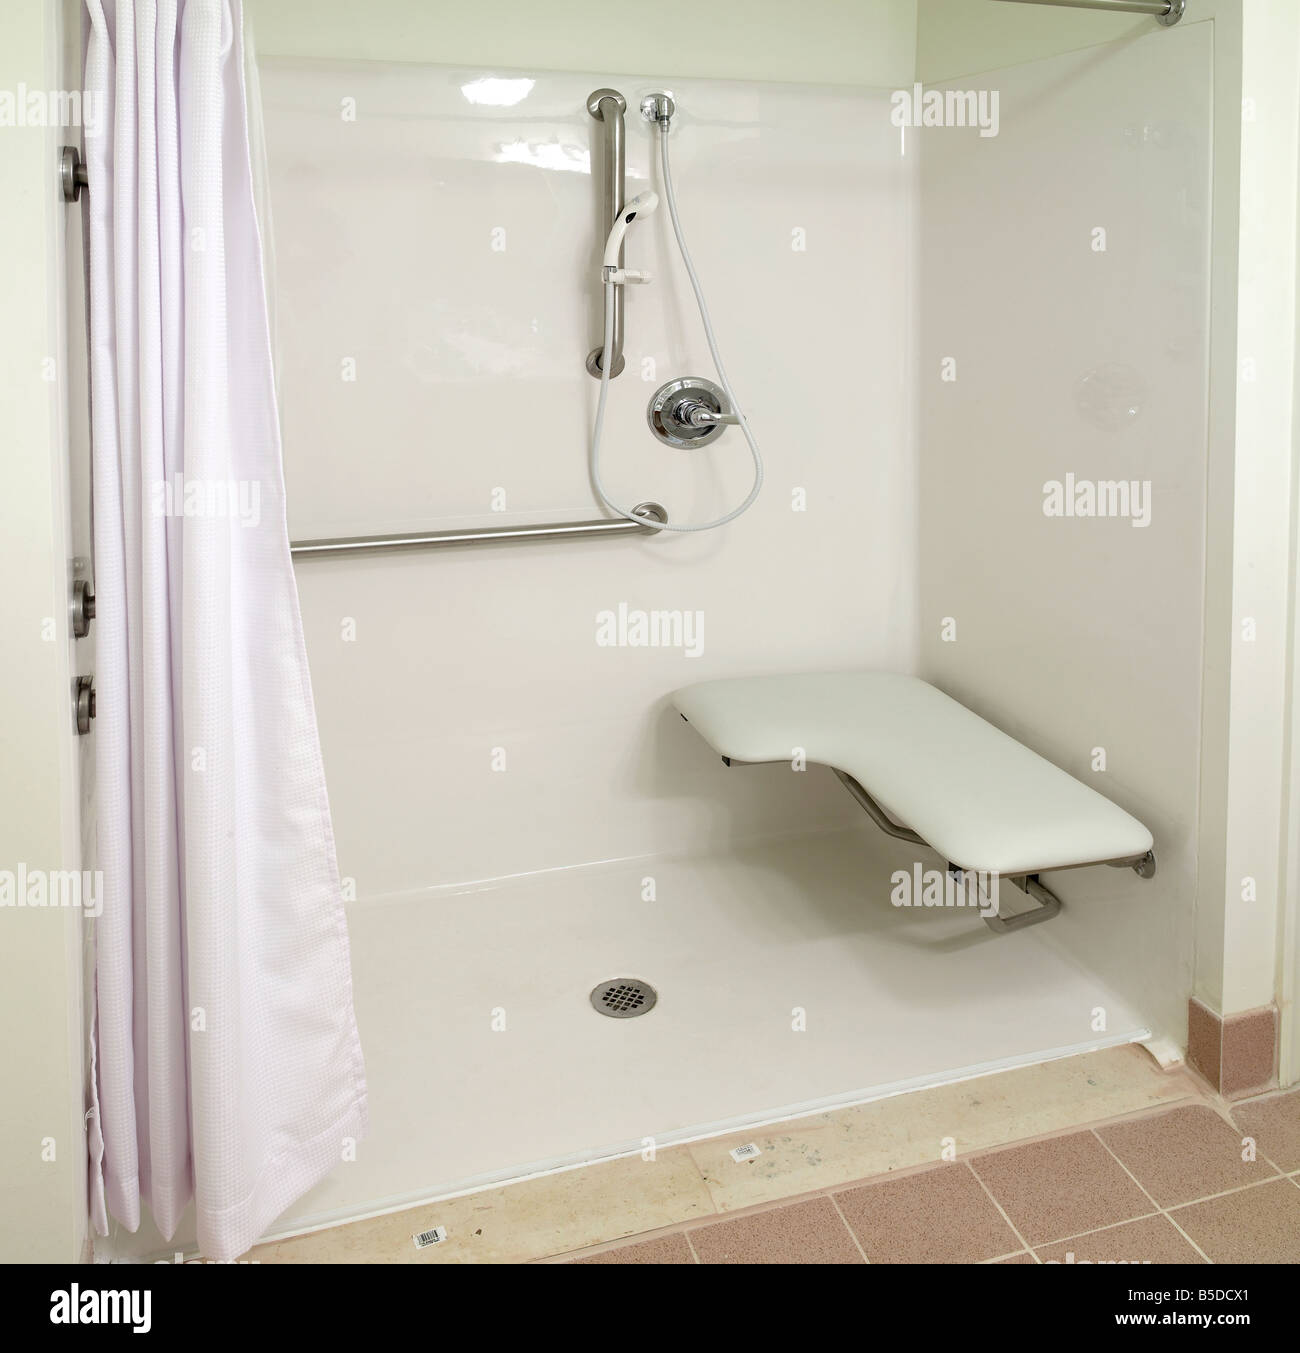 Elderly handicap shower stock photo royalty free image 20579161 alamy - Duchas geriatricas ...